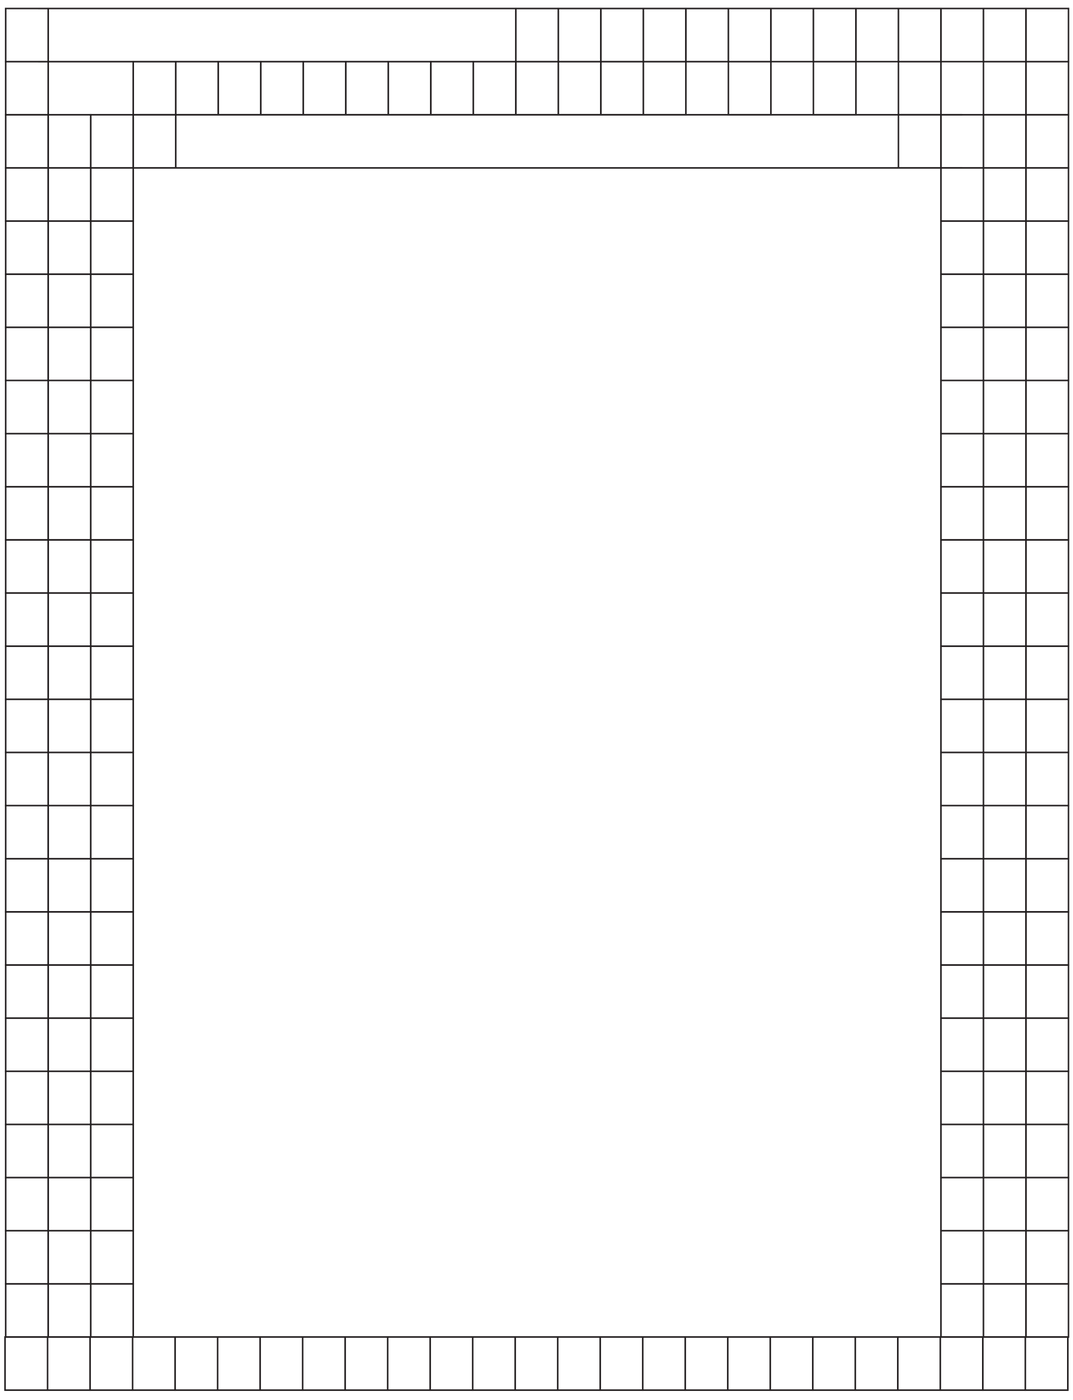 kolom-kotak 61-02.png